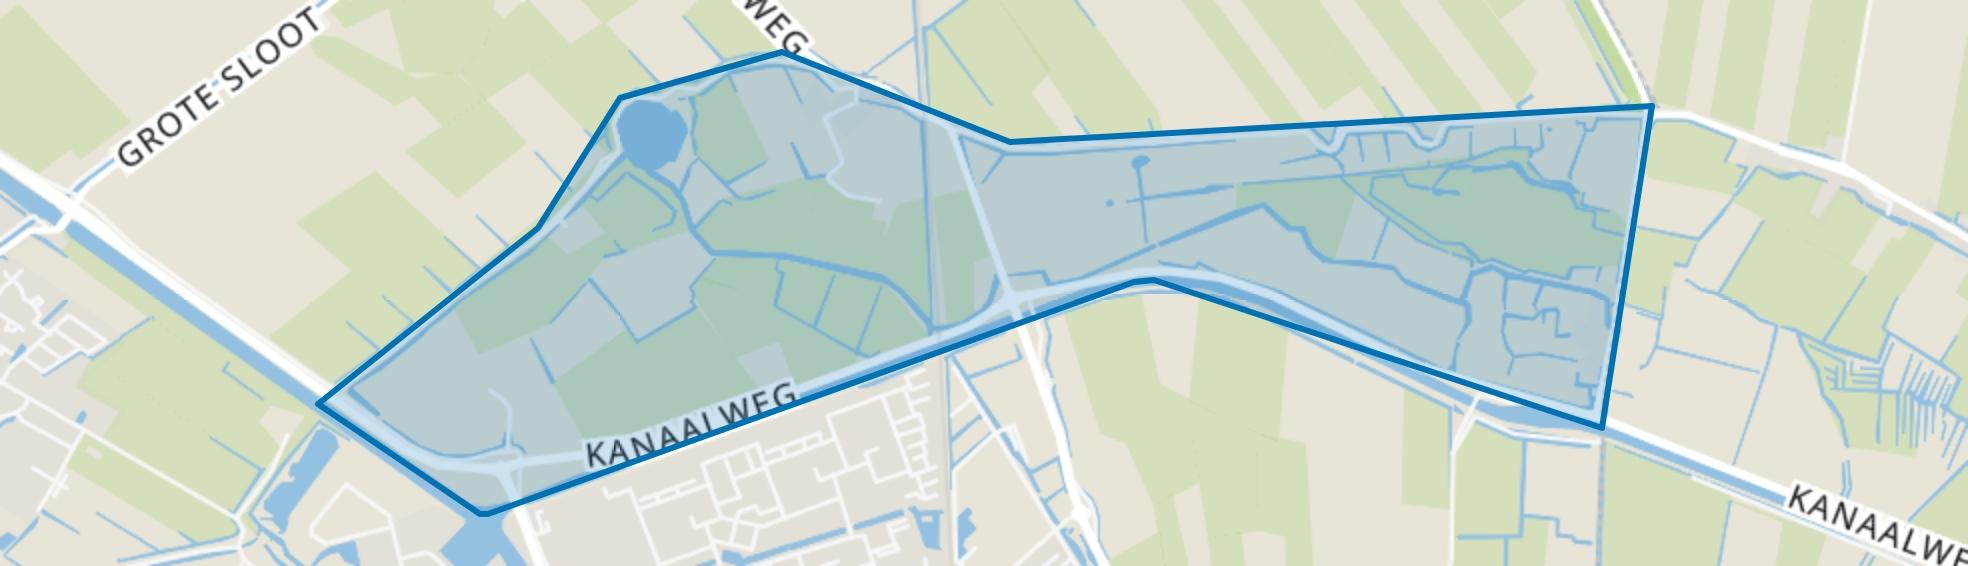 Keinse, 't Wad en Buitengebied, Schagen map